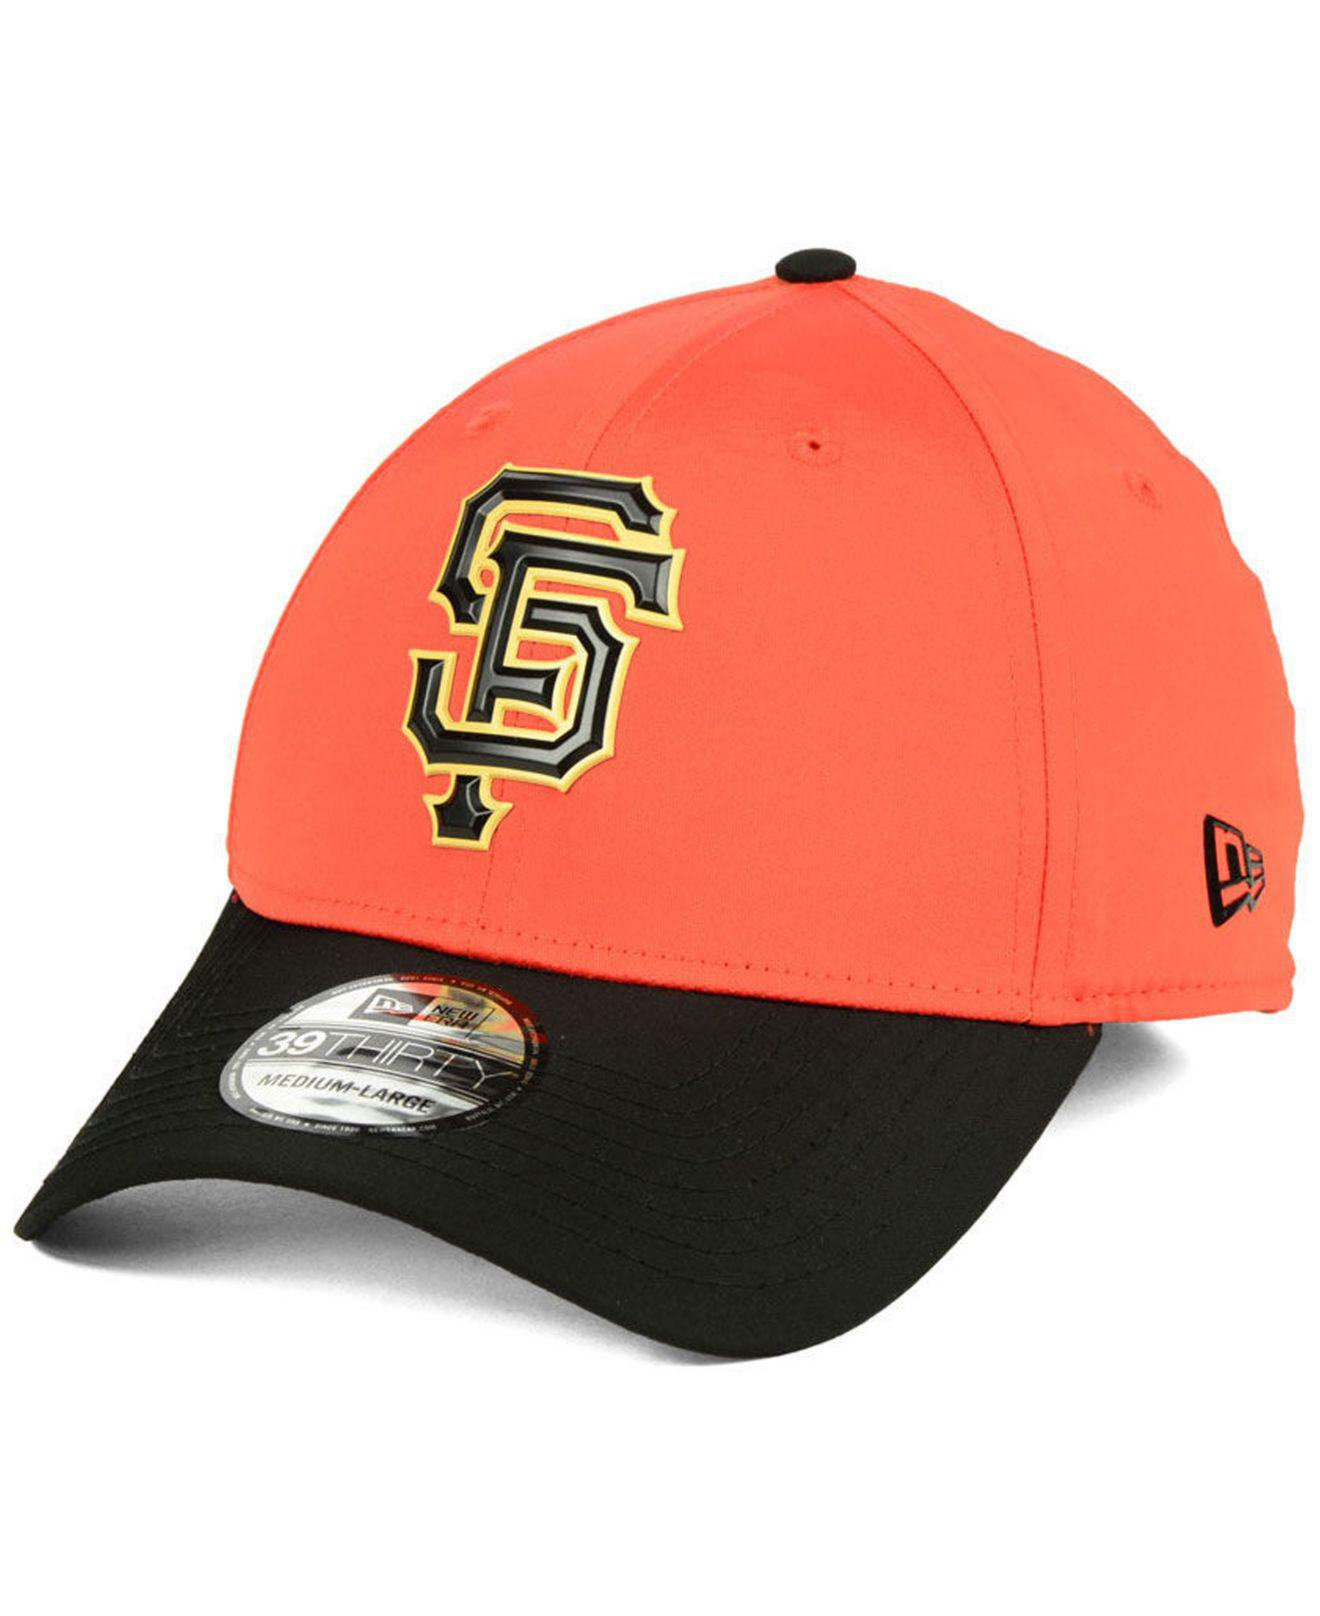 watch 06ad8 026f1 ... shop ktz. mens black san francisco giants batting practice 39thirty cap  809f1 3fe5f